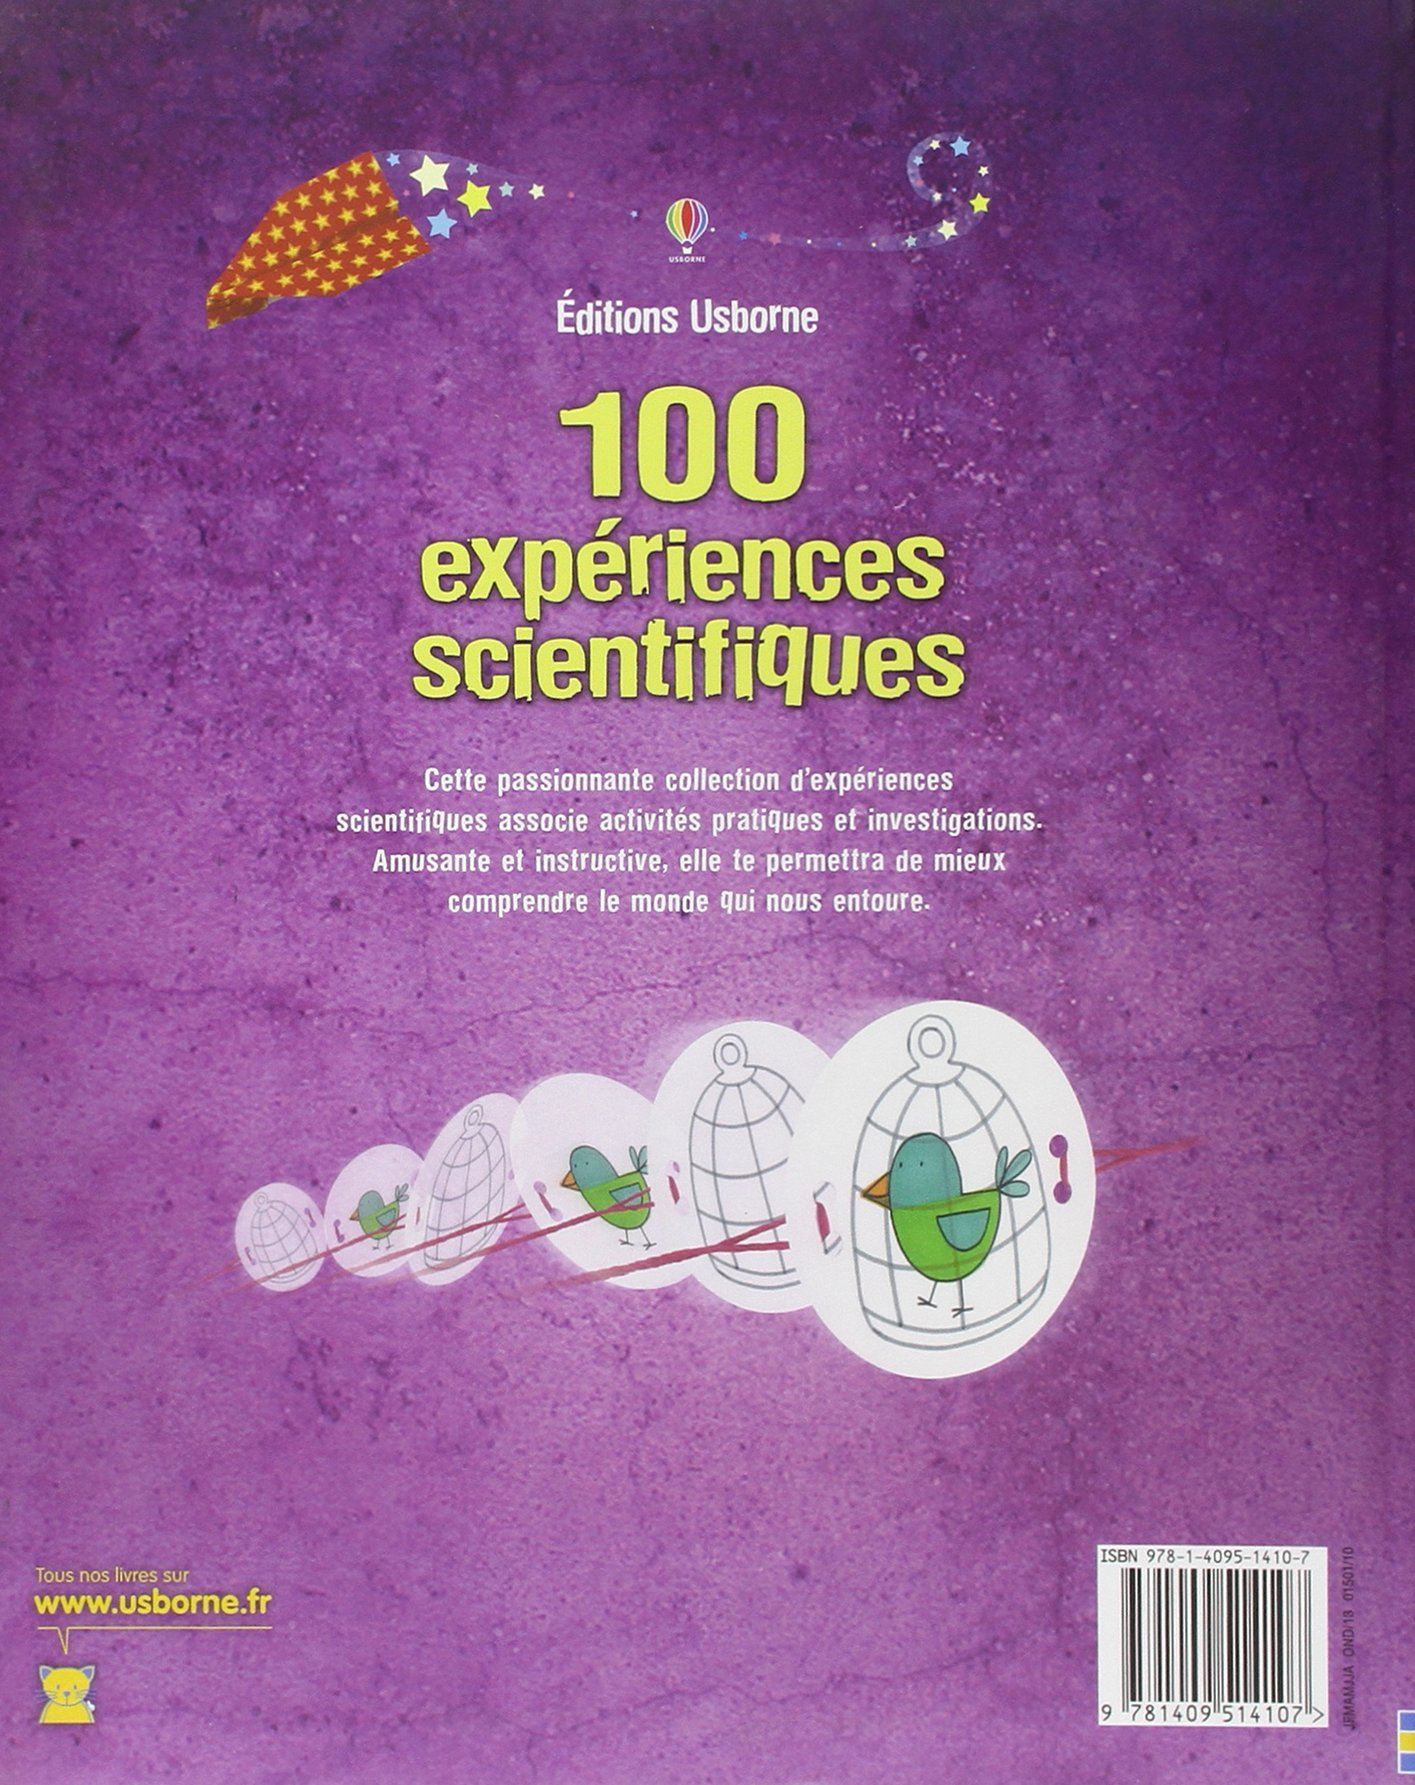 100 expériences scientifiques - avec liens internet: Amazon.fr: Georgina  Andrews, Kate Knighton, Stella Baggott, Zoe Wray, George Bogdis: Livres